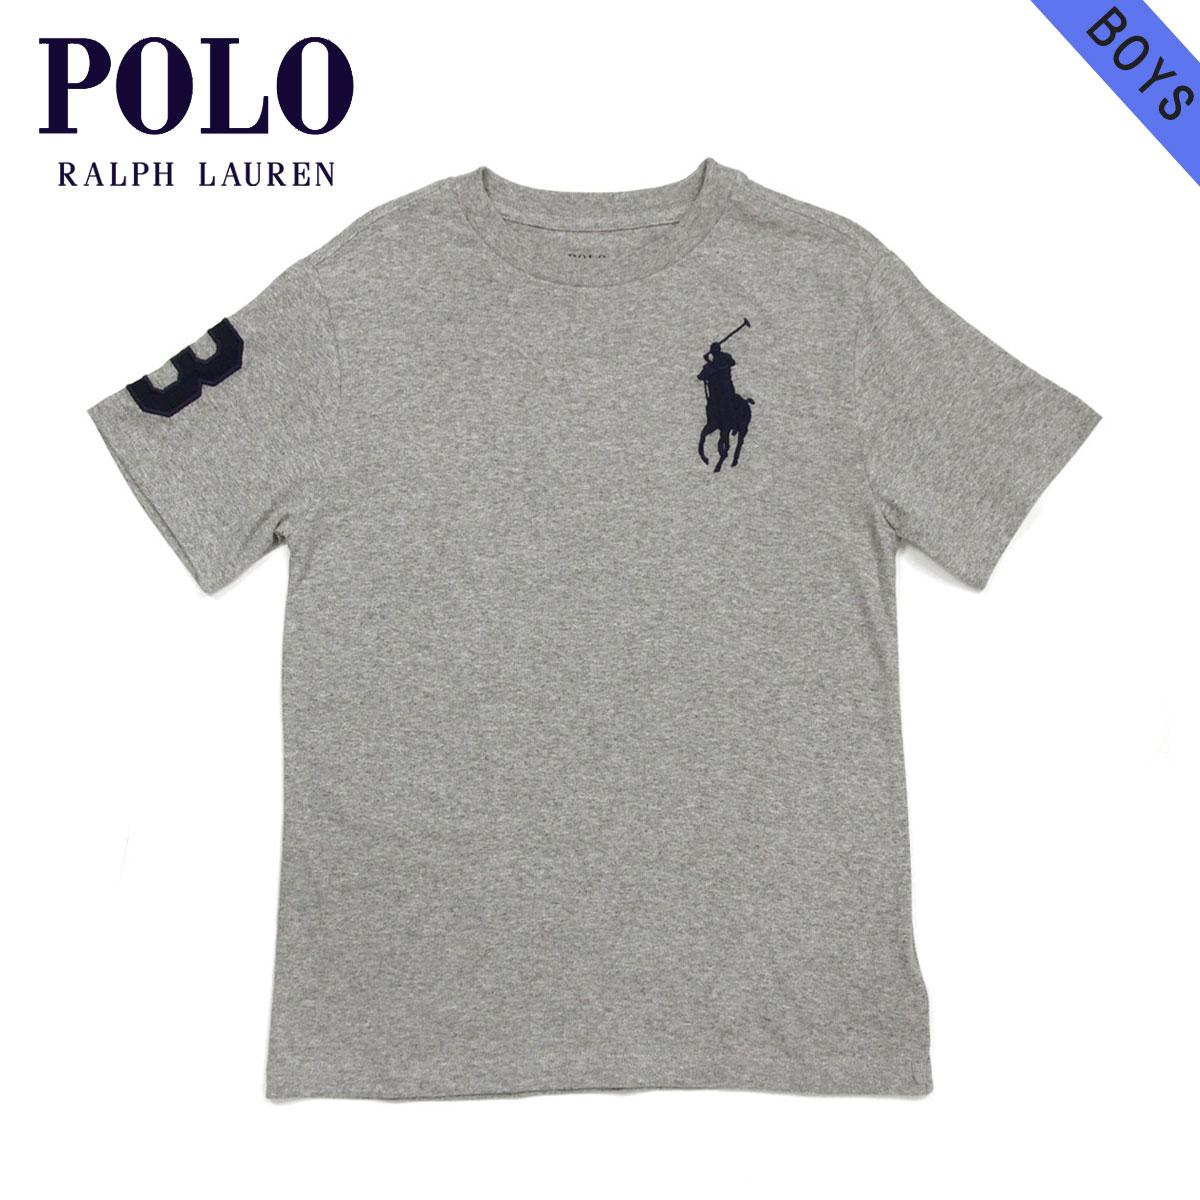 0041b6273a35 Rakuten Ichiba shop MIXON  Polo Ralph Lauren kids POLO RALPH LAUREN CHILDREN  regular article children s clothes Boys big pony short sleeves T-shirt BIG  PONY ...